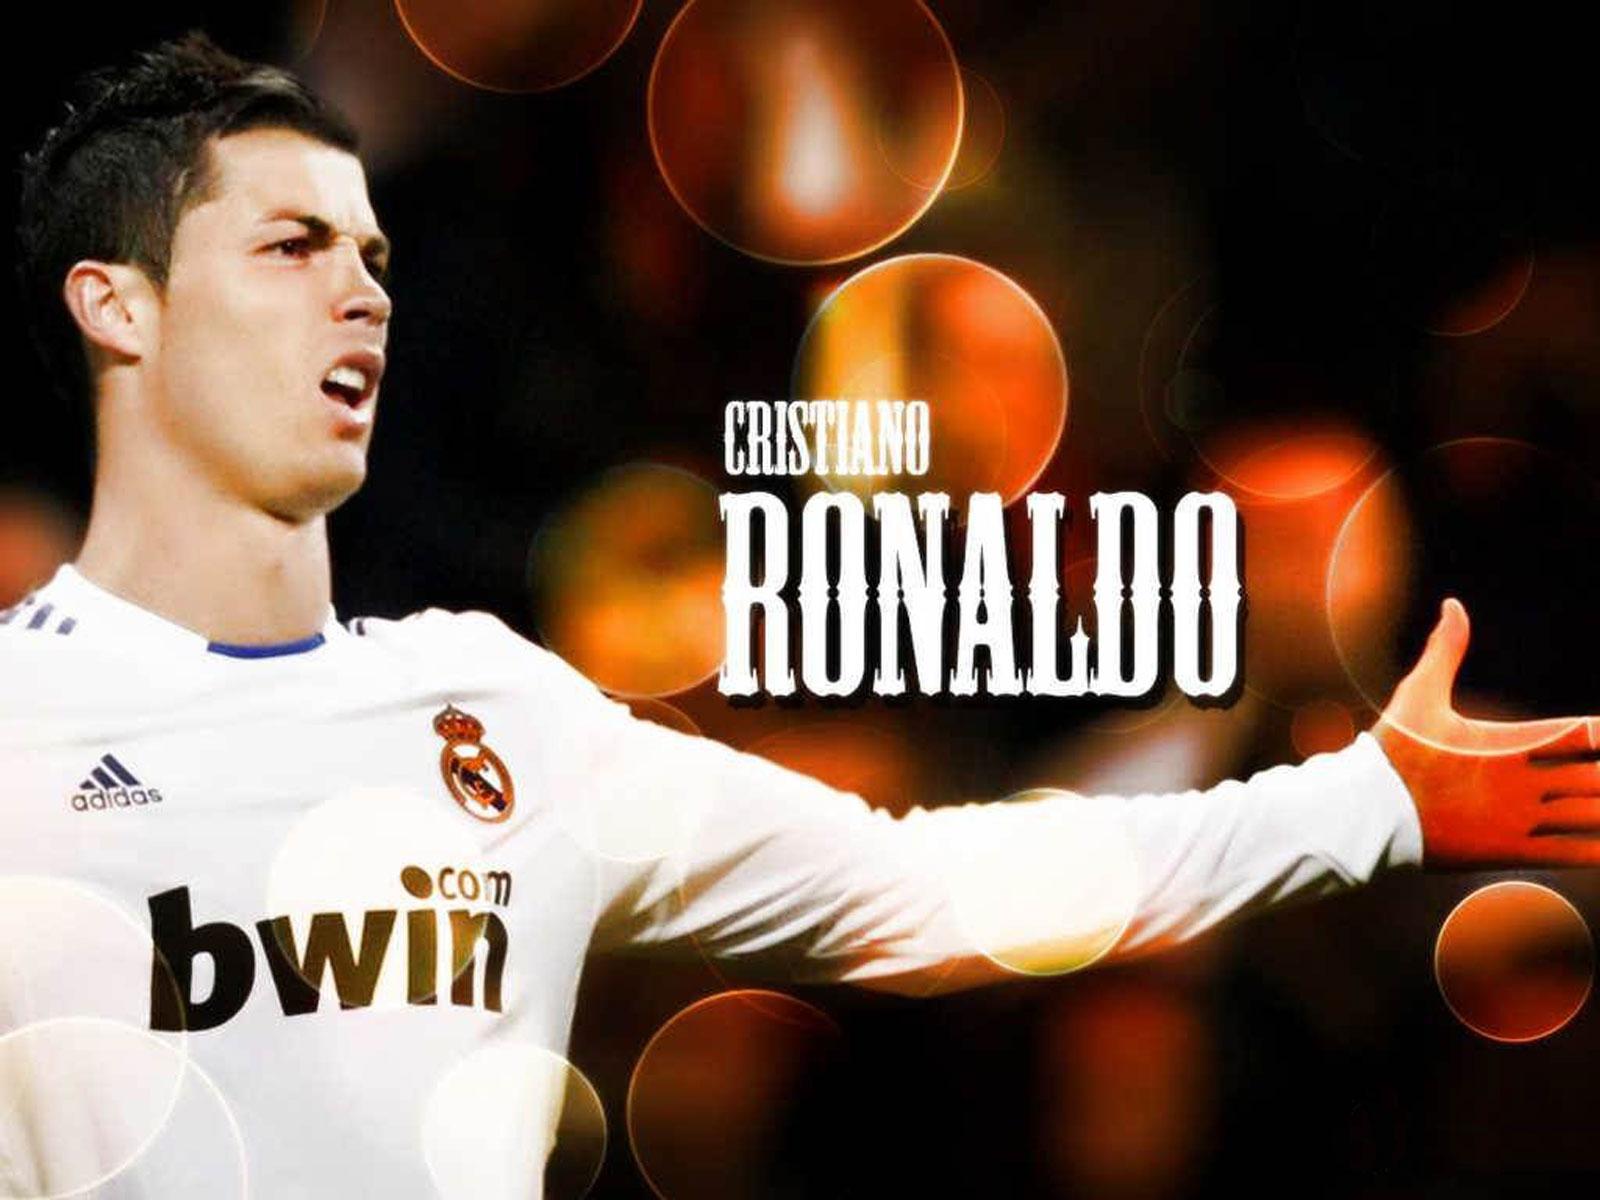 Cristiano Ronaldo 2012 Wallpapers